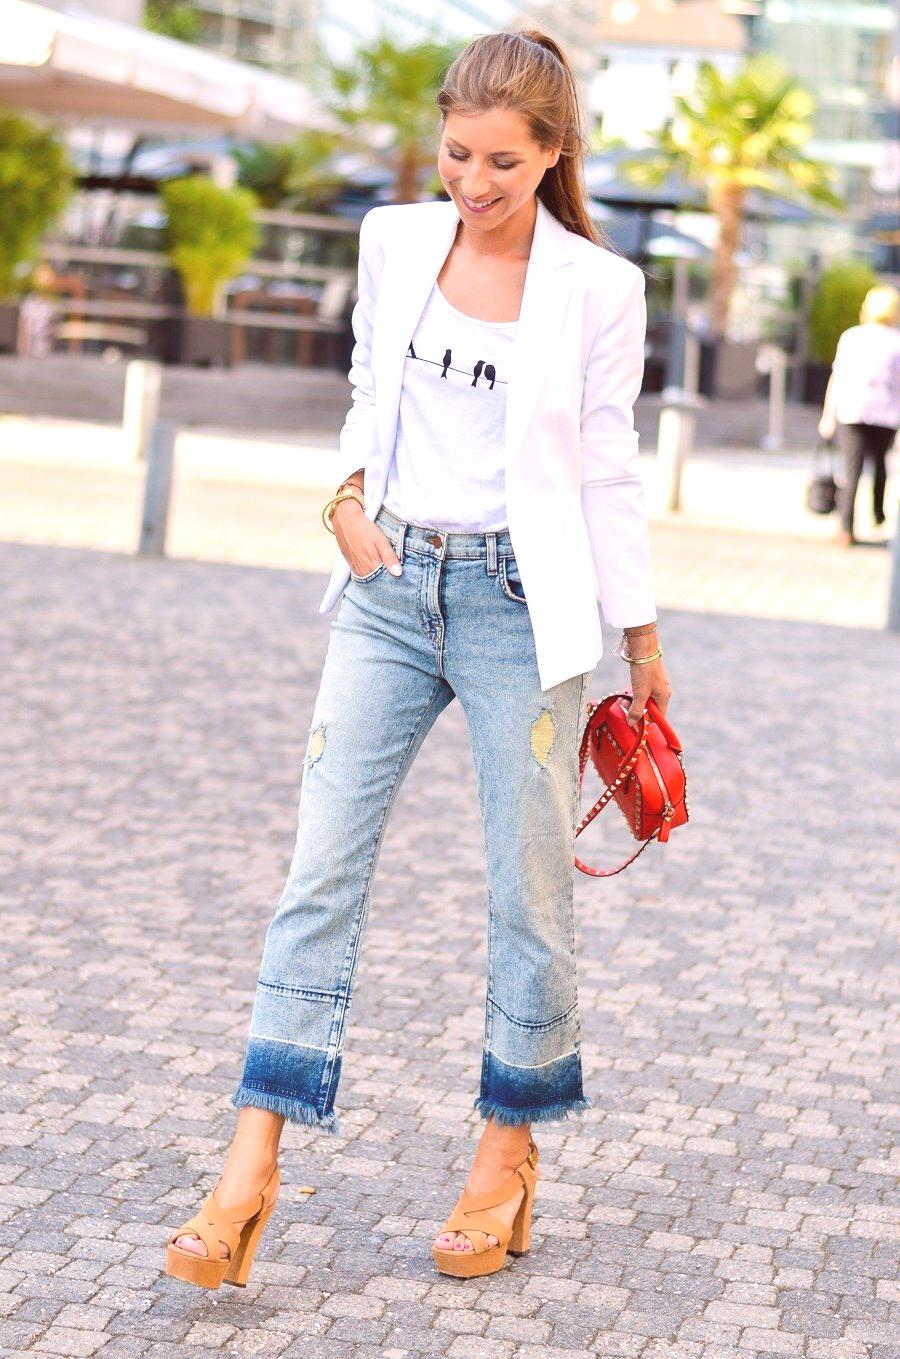 Modetrends Ideen Sommer Trends